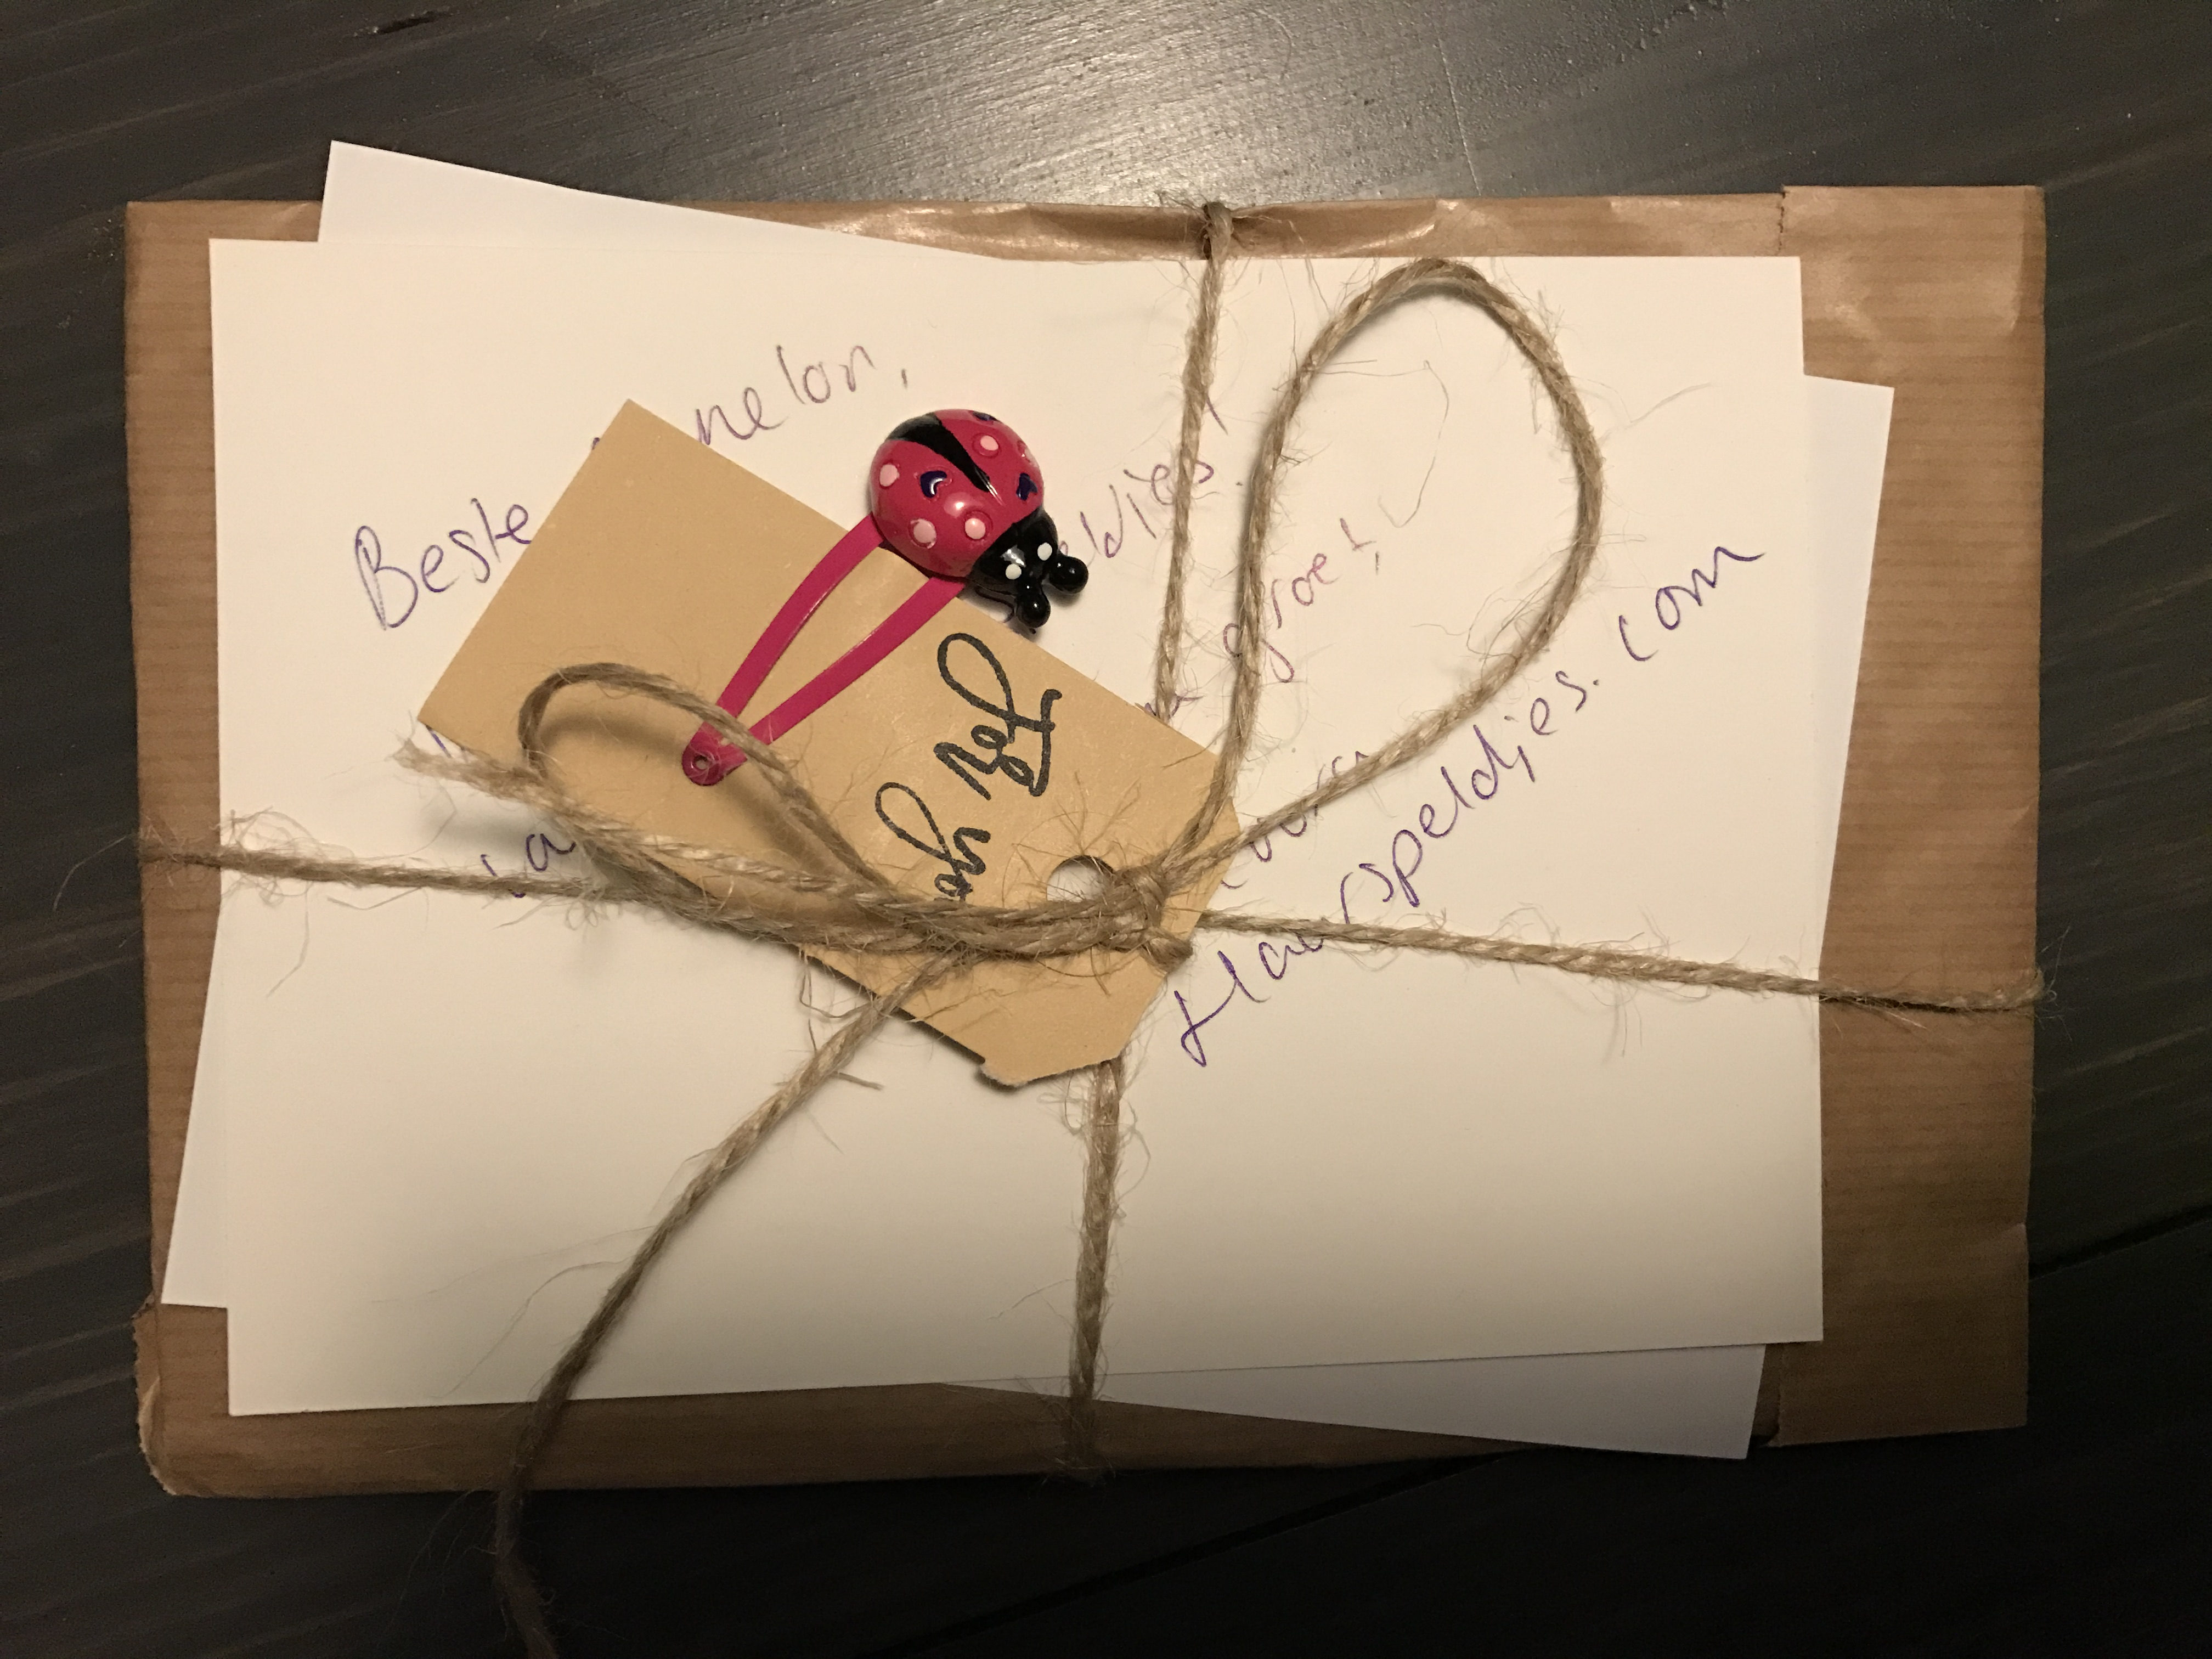 11-16-haarspeldjes-sinterklaas-kerst-cadeau-meisje-leuk-verpakt-verpakking-mooi-strikjes-klipjes-baby-tip-cadeau-verpakt